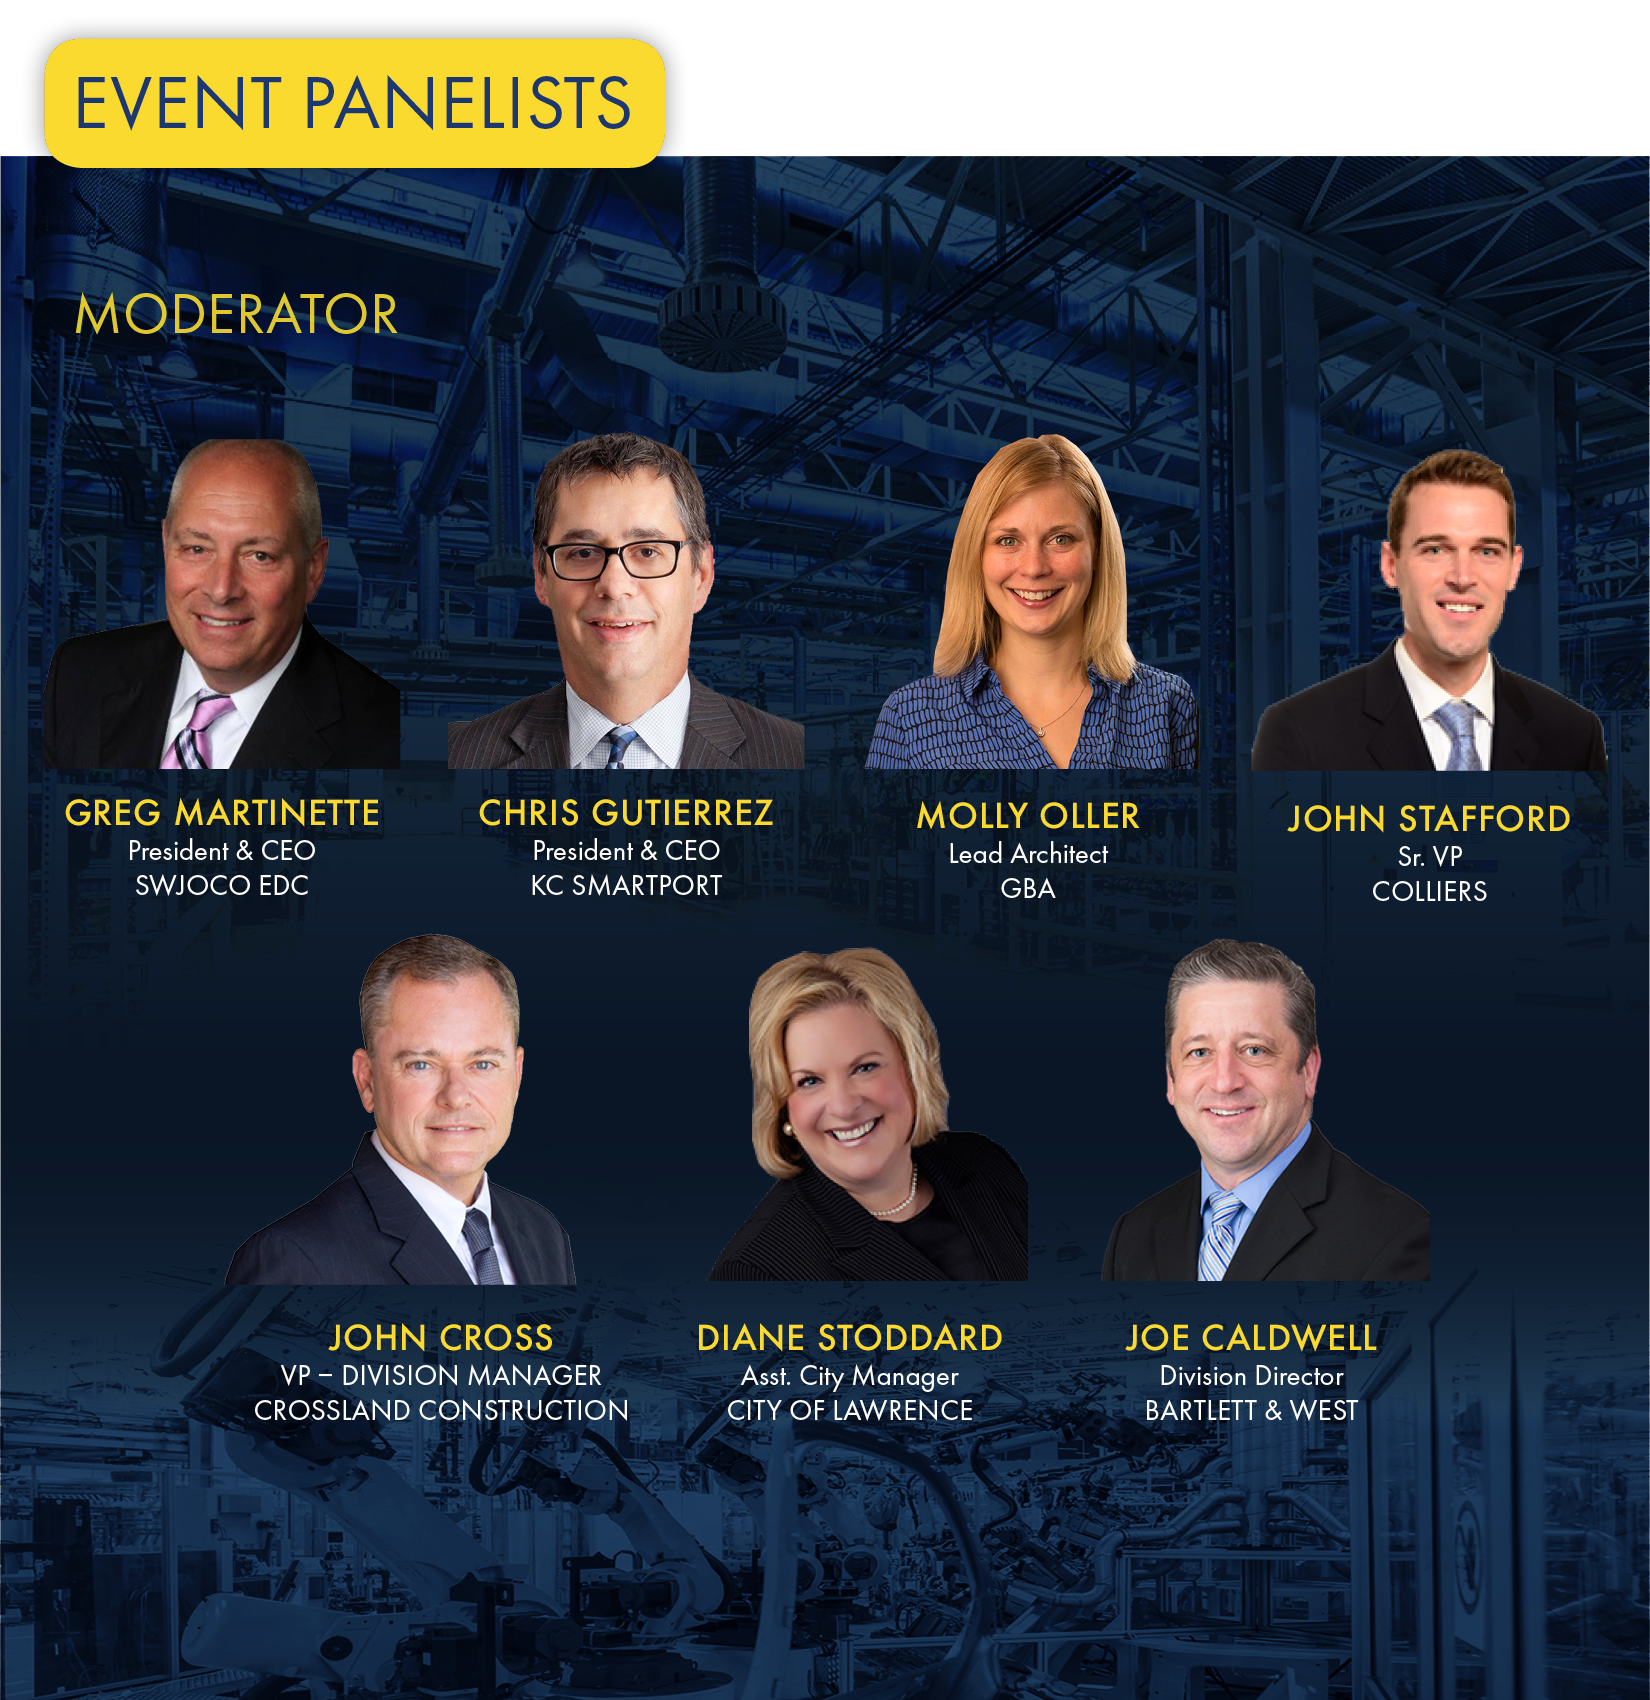 Industrial Summit 2018_panelist image FINAL.png